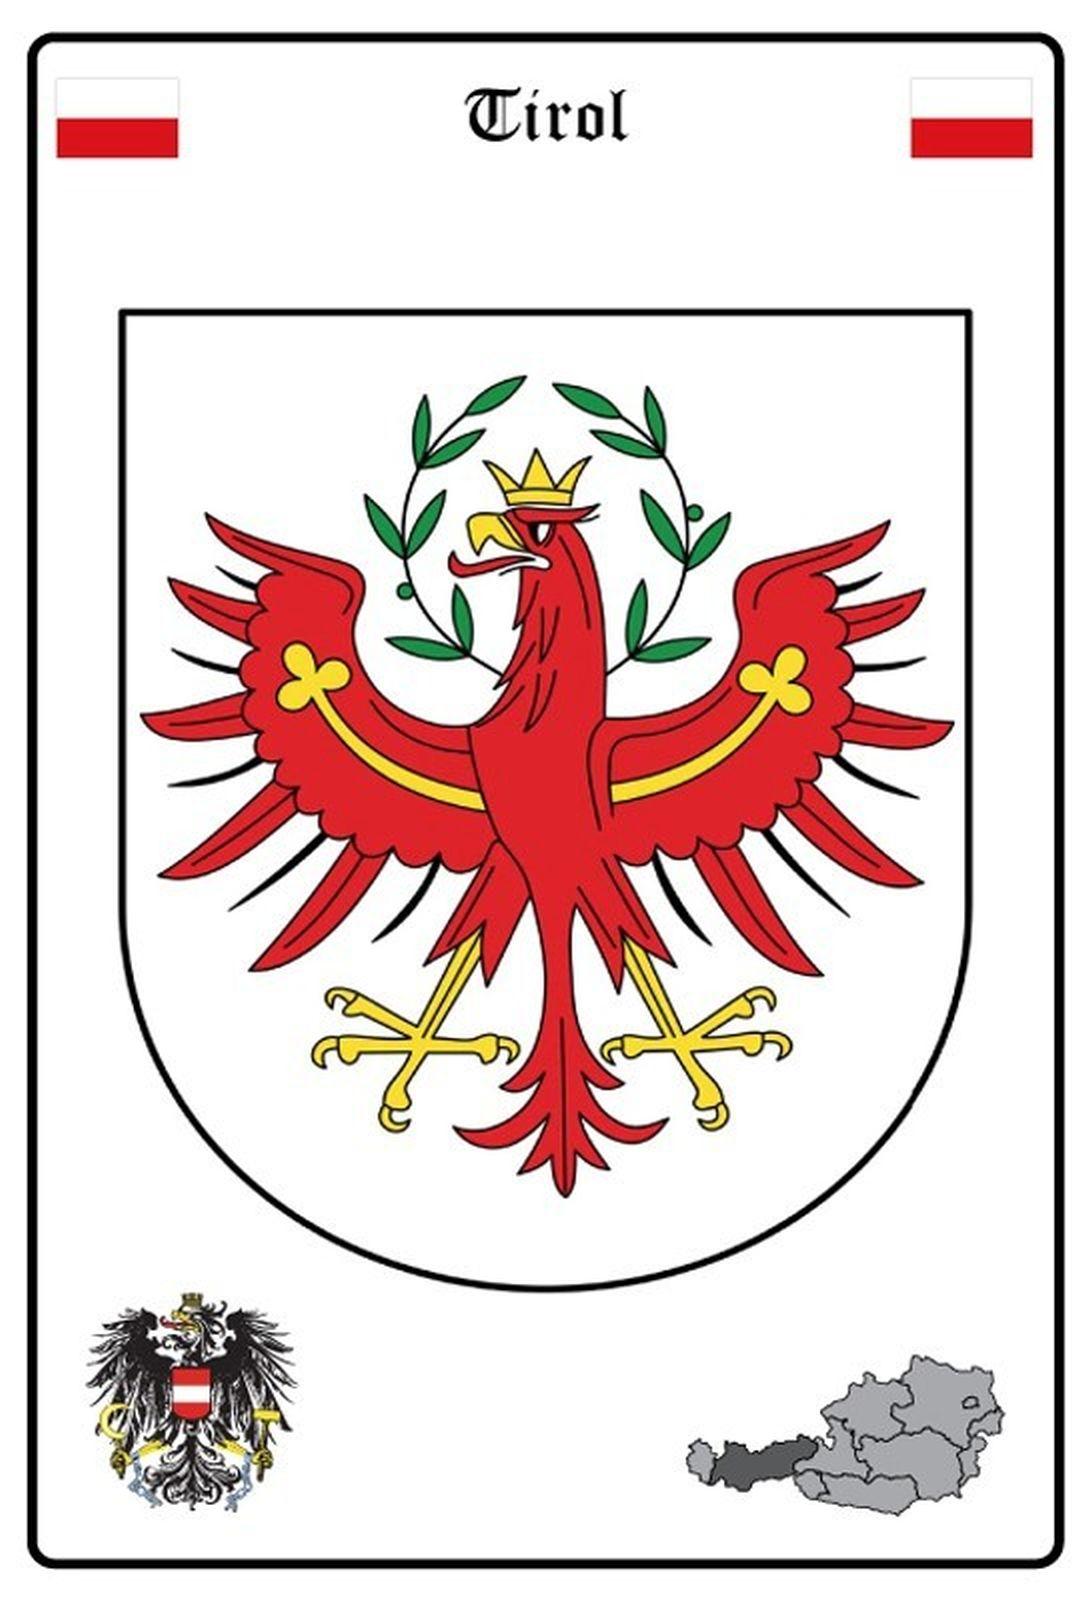 Blechschild Österreich Wappen Metallschild Wanddeko 20x30 cm tin sign